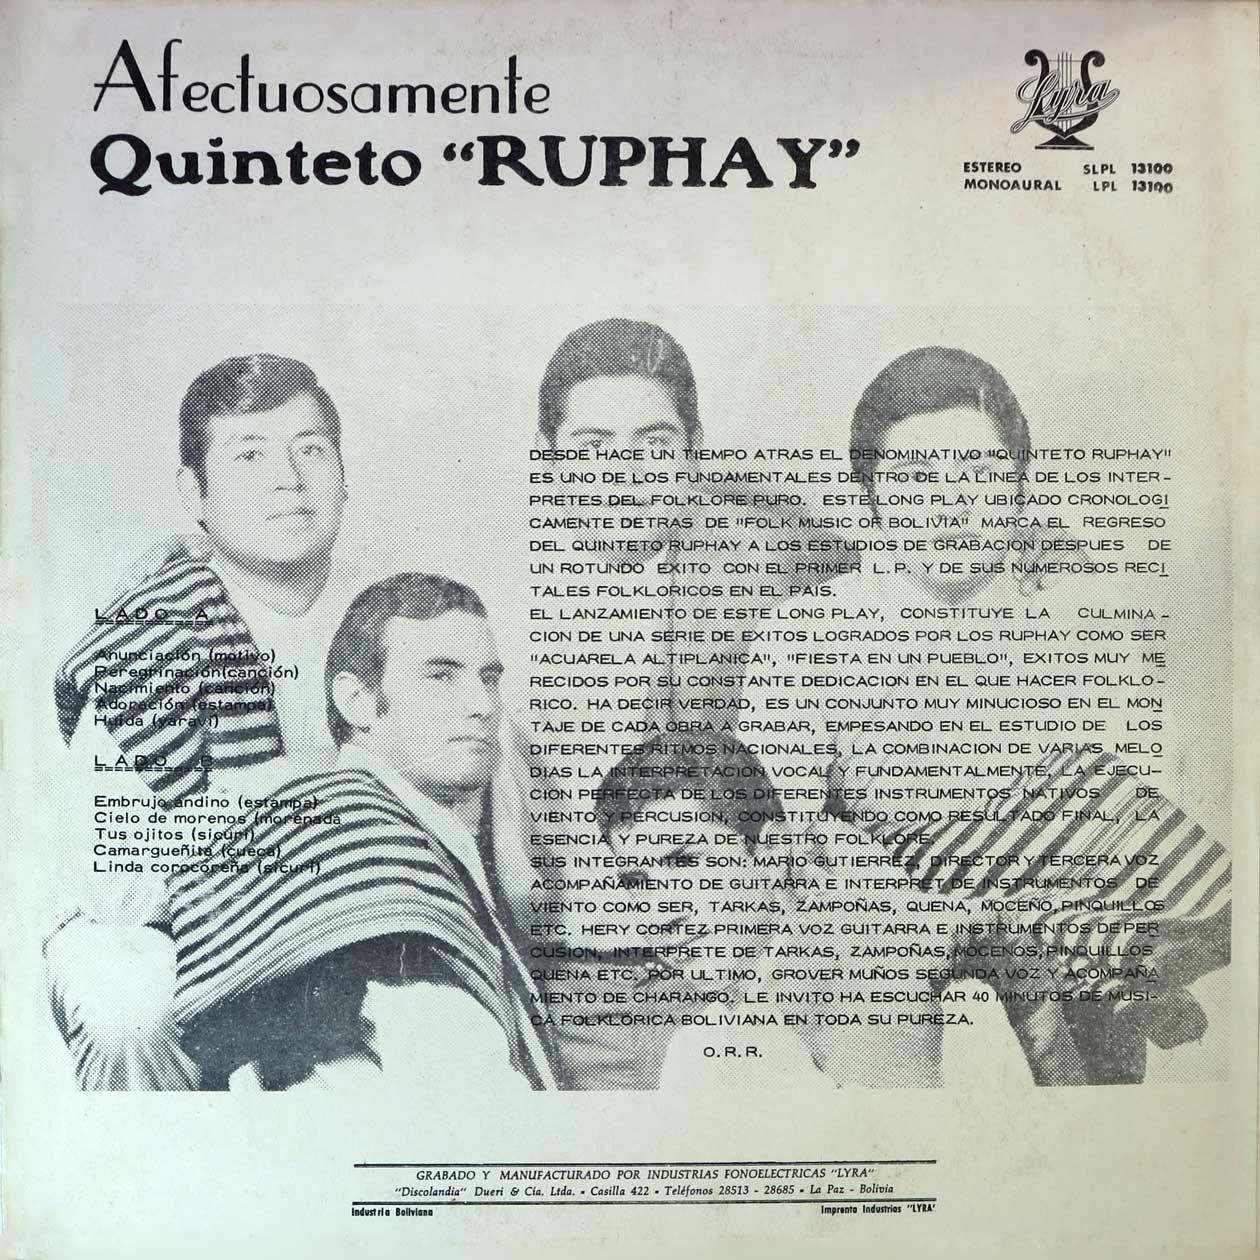 Ruphay - Embrujo andino